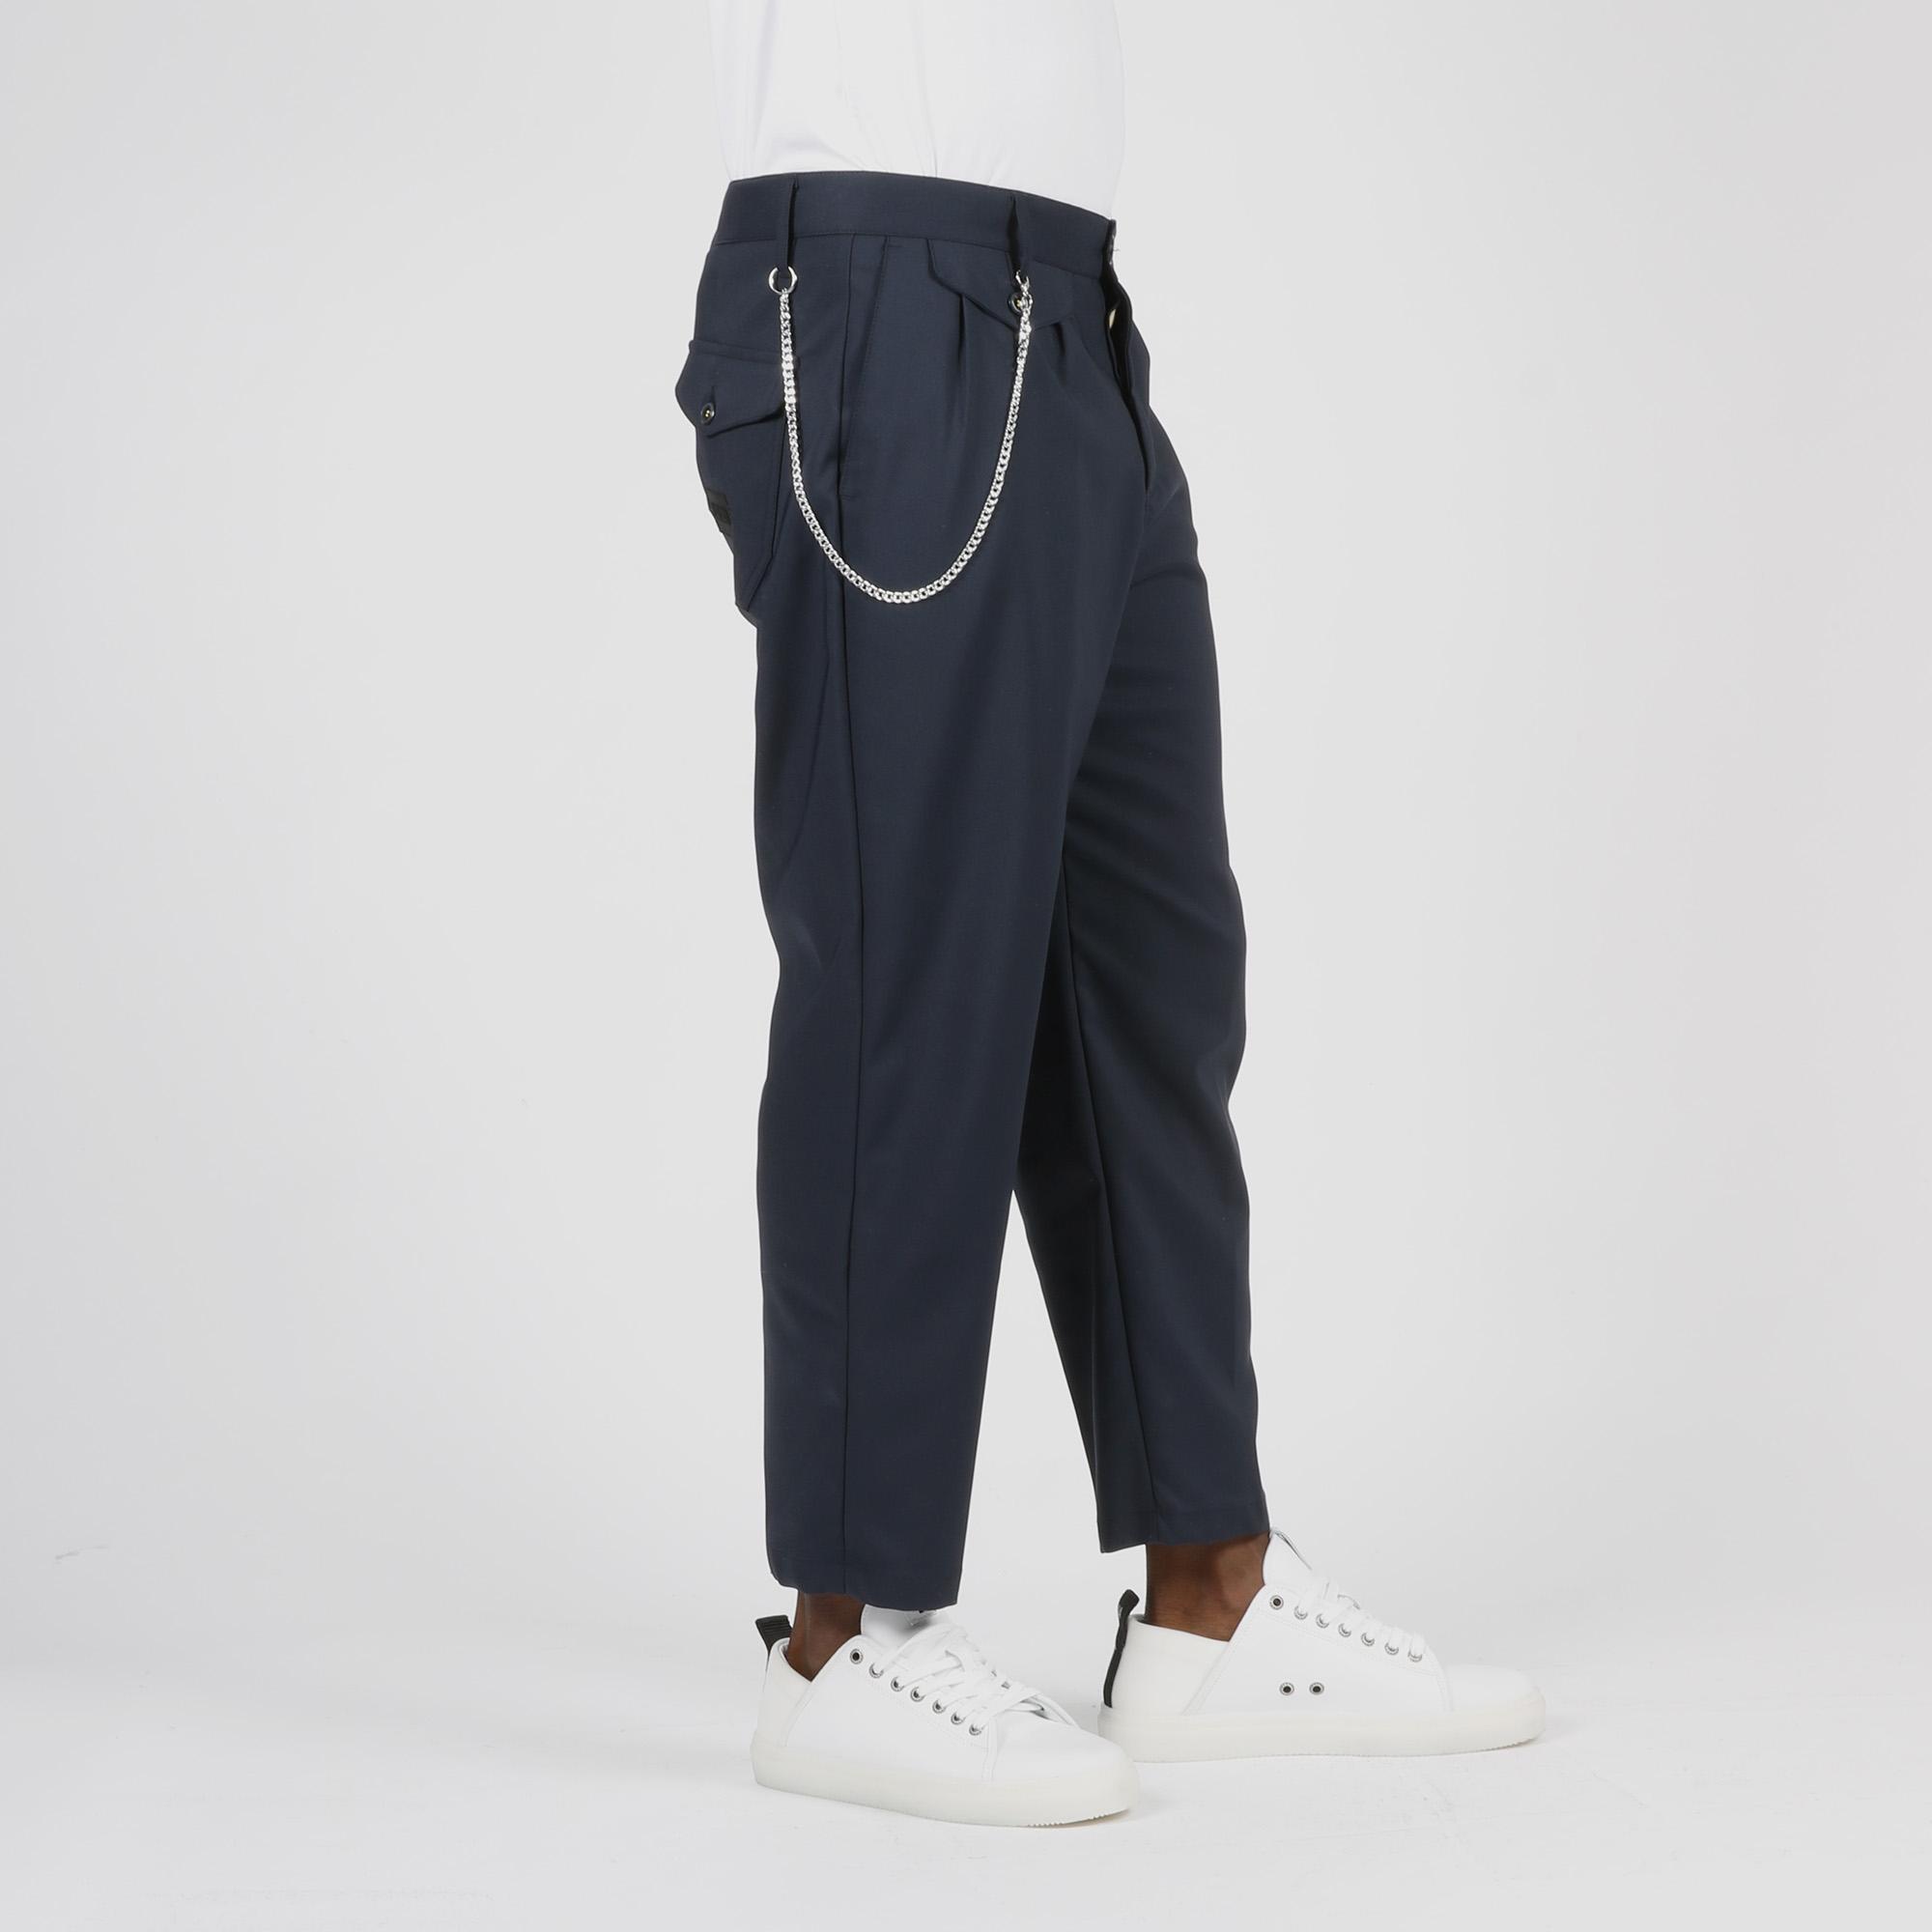 Pantalone wide led con catena - Blu